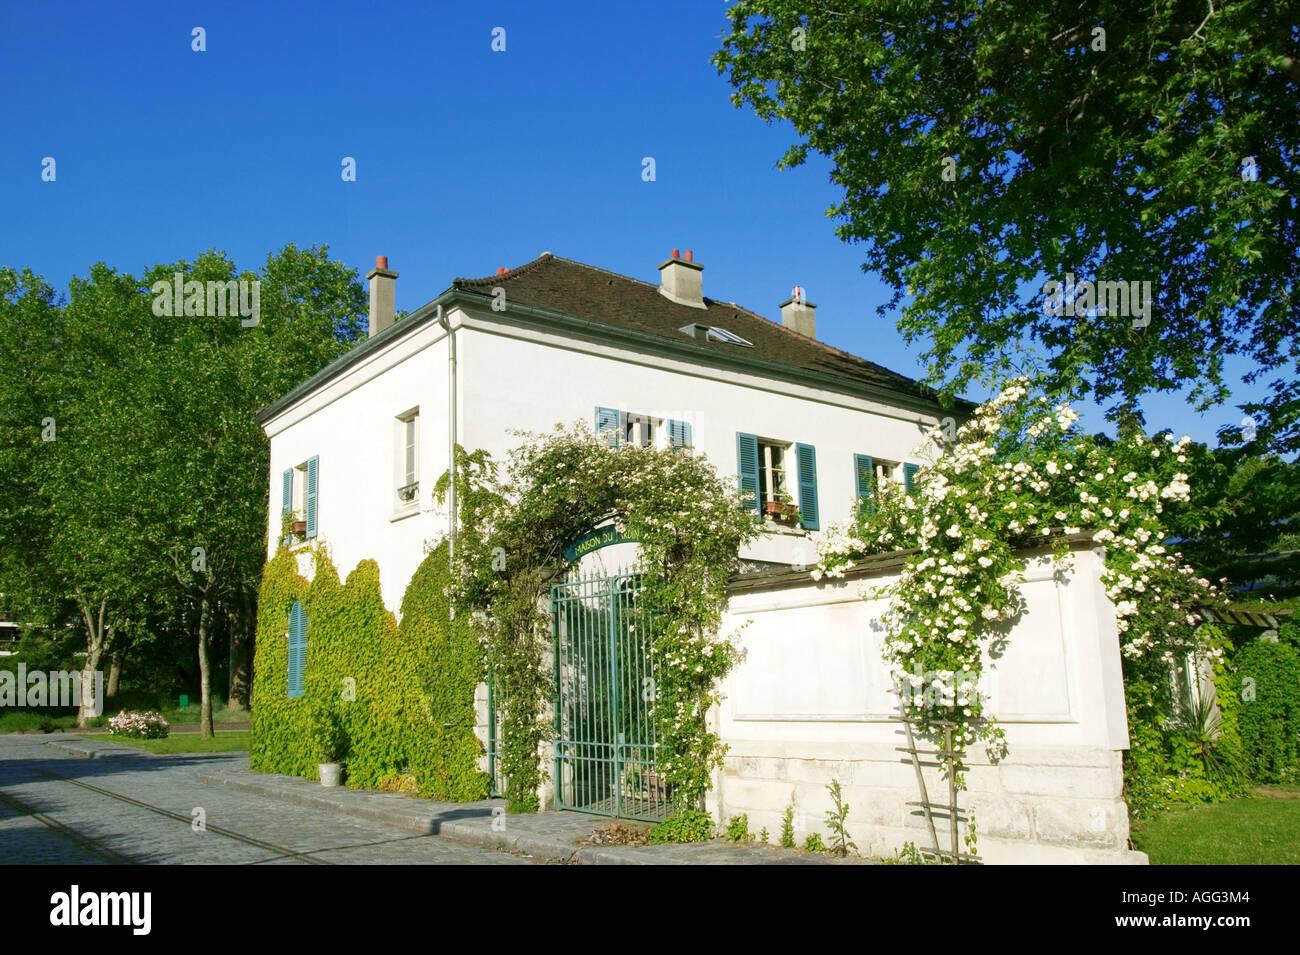 Garden of Bercy - Paris - France Stock Photo